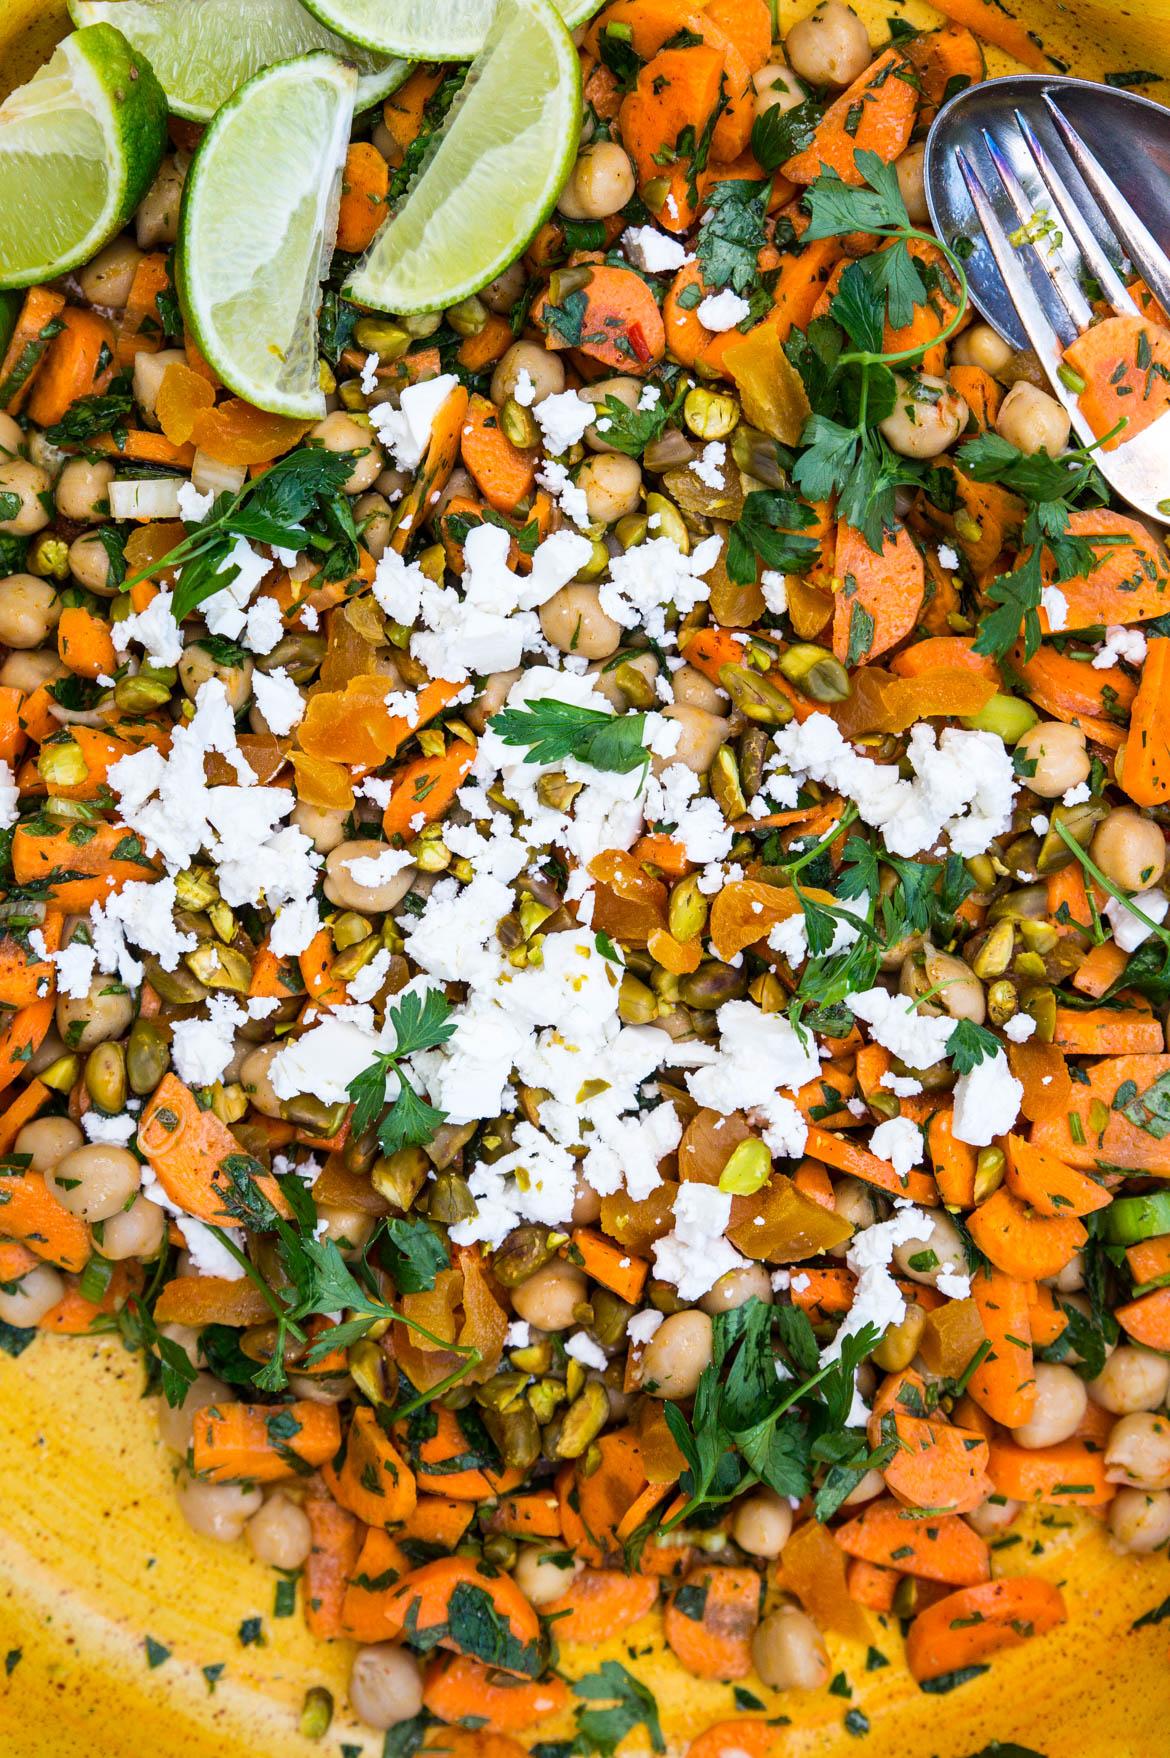 Marrokansk gulerodssalat